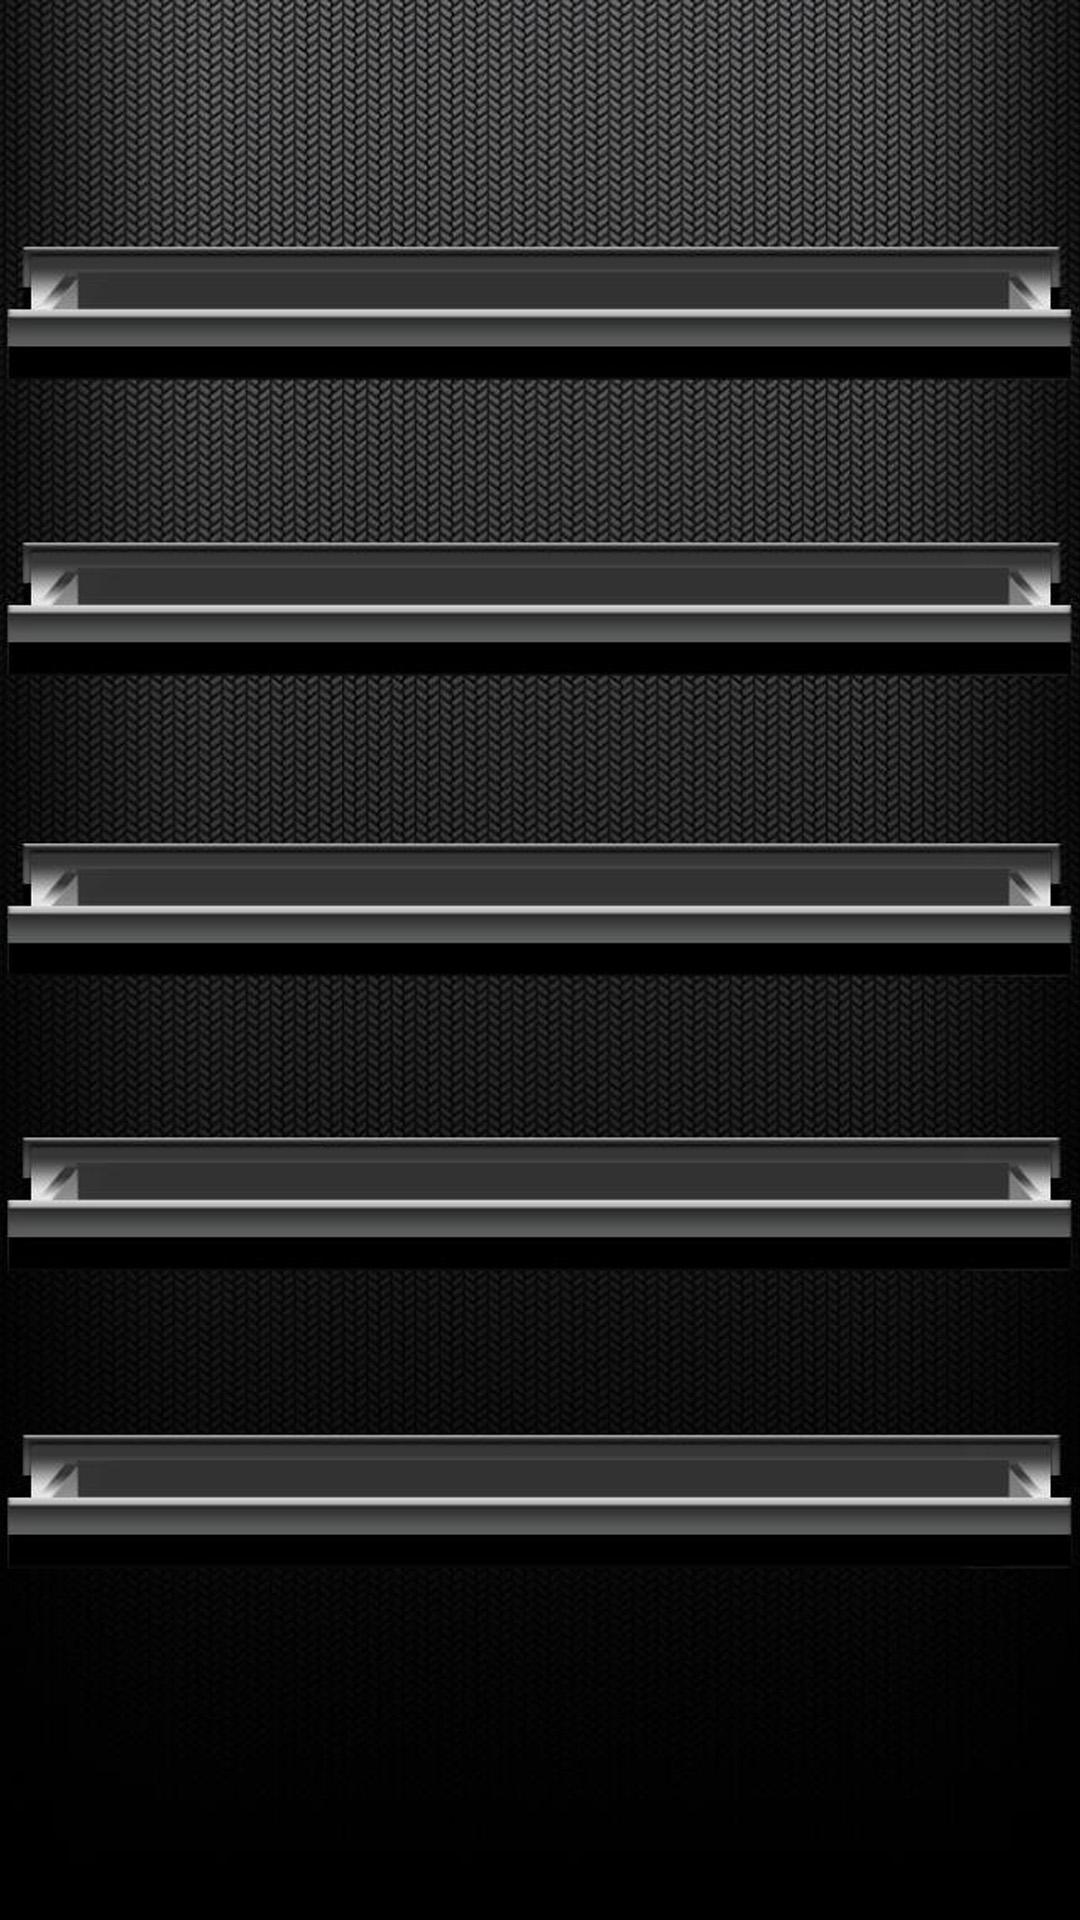 50 Iphone 6 Plus Shelf Wallpaper On Wallpapersafari